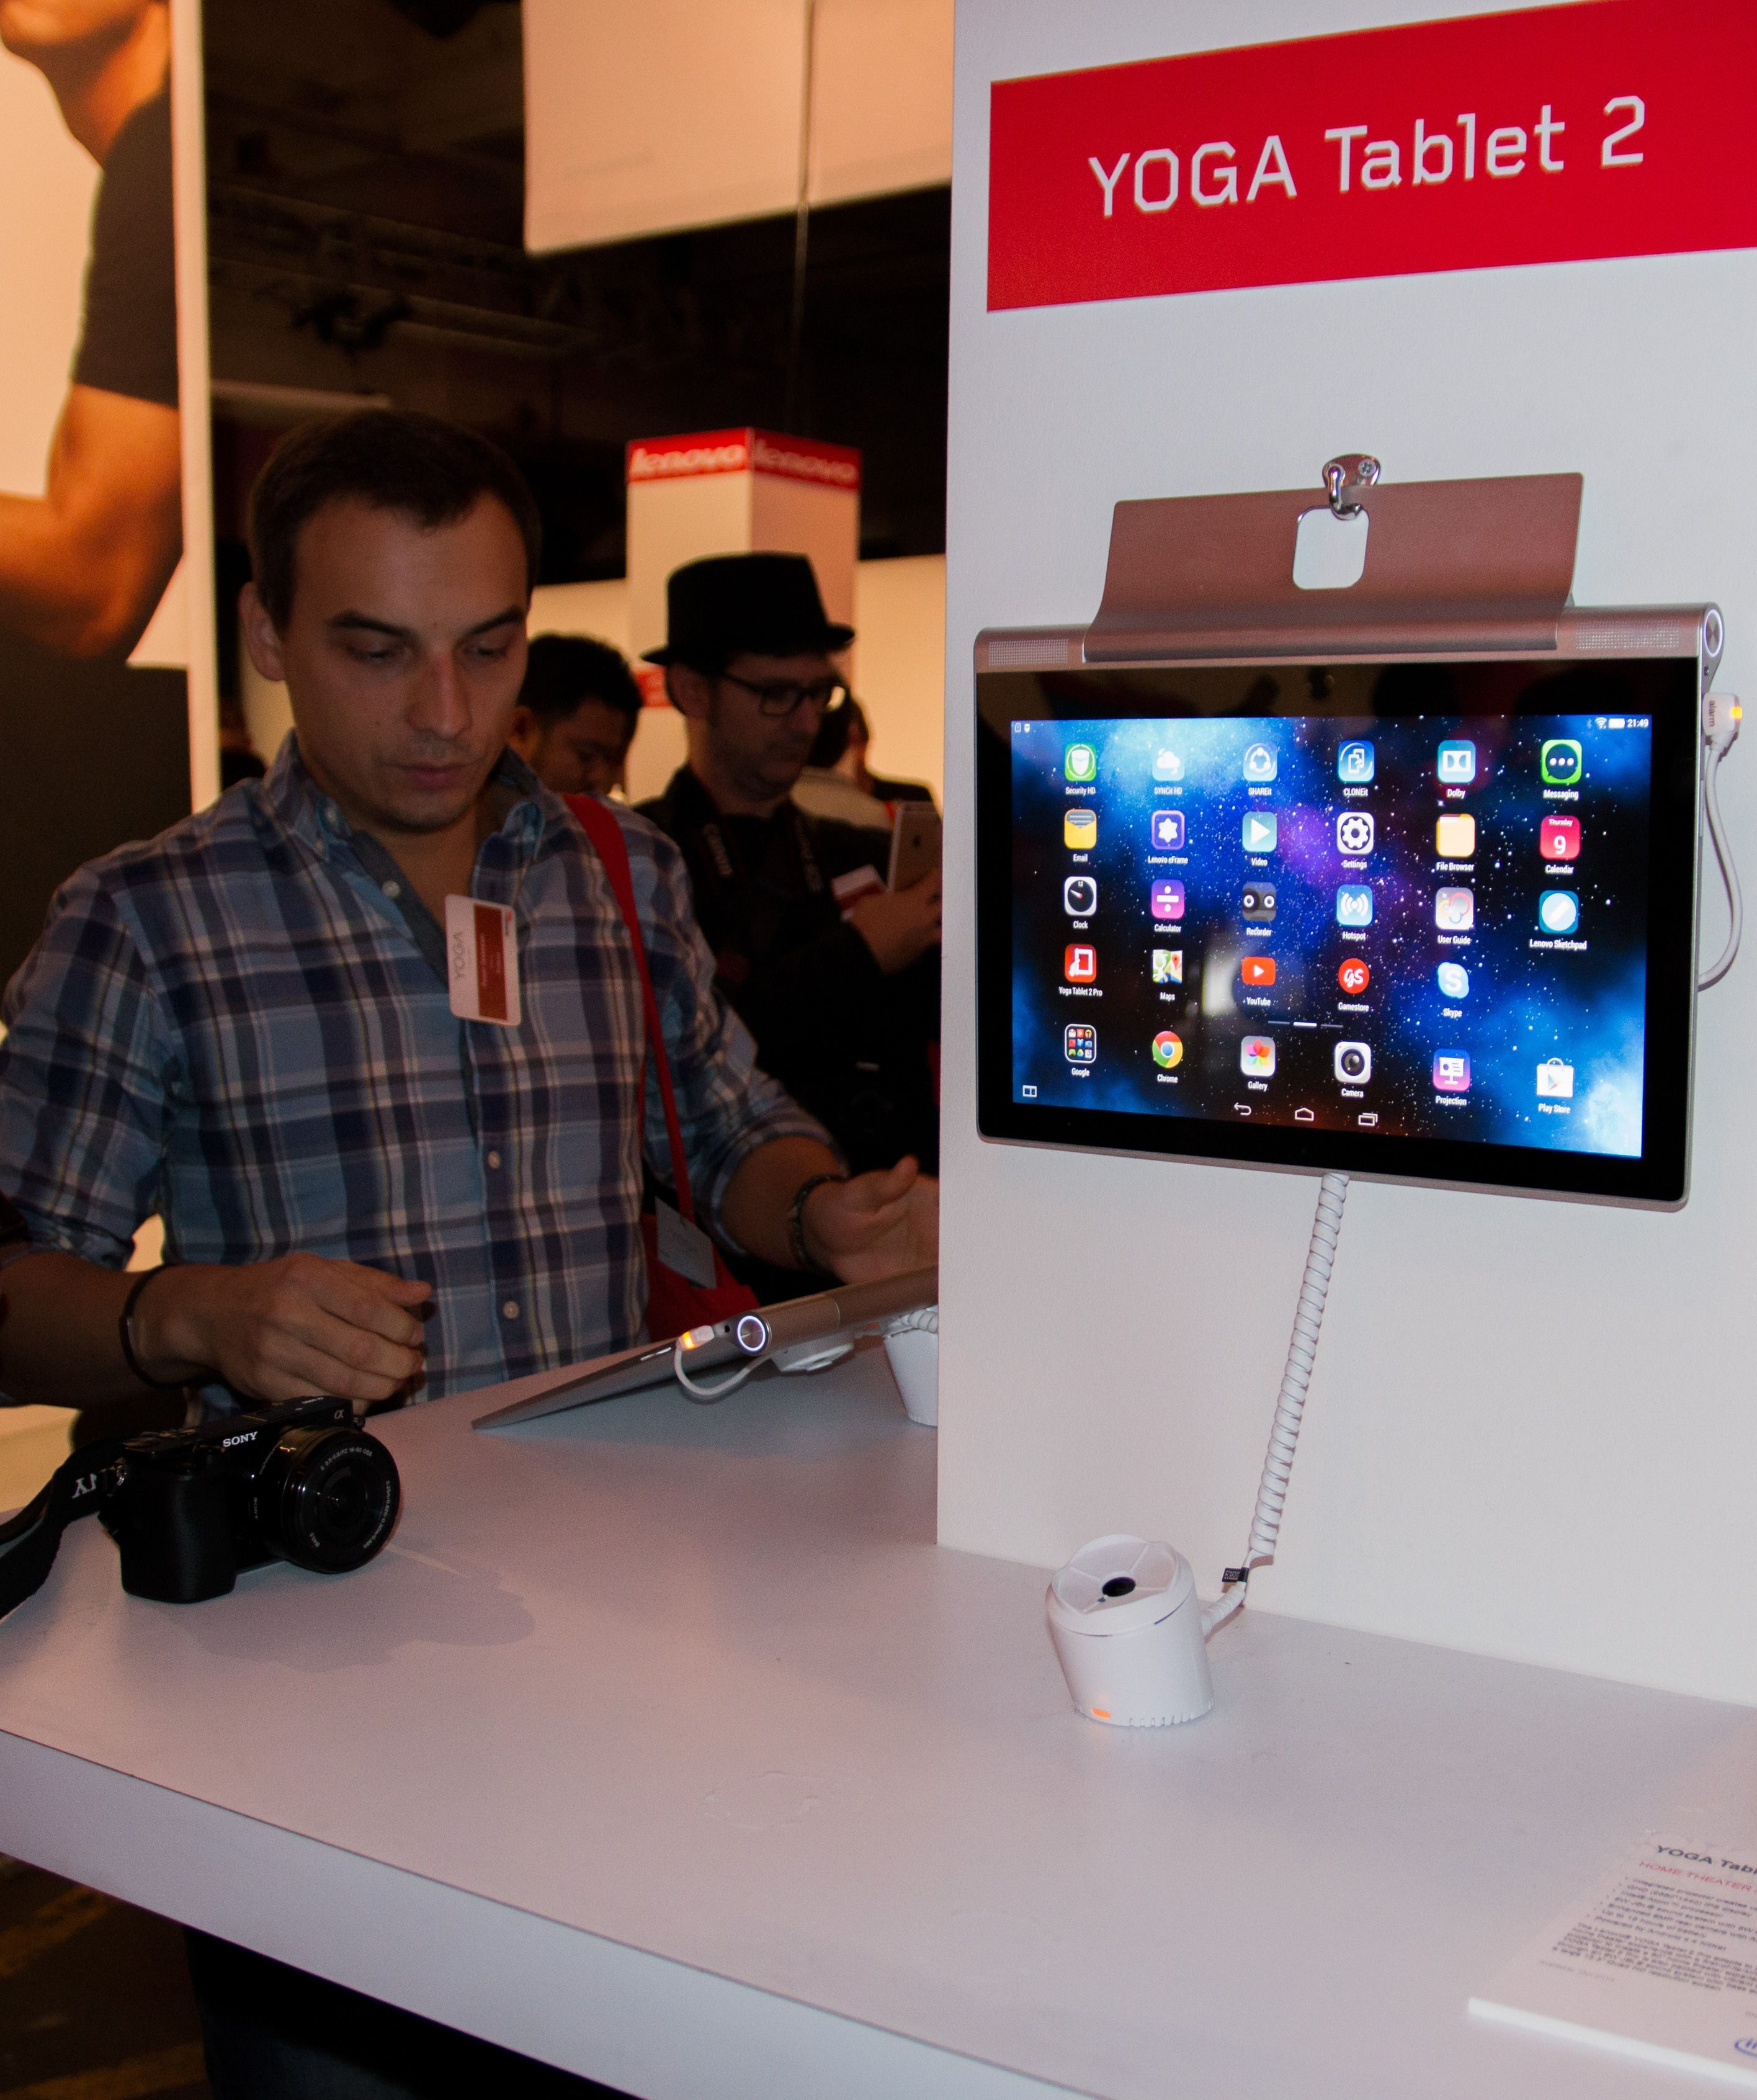 Nå kan Yoga Tablet 2 også henge.Foto: Anders Brattensborg Smedsrud, Tek.no